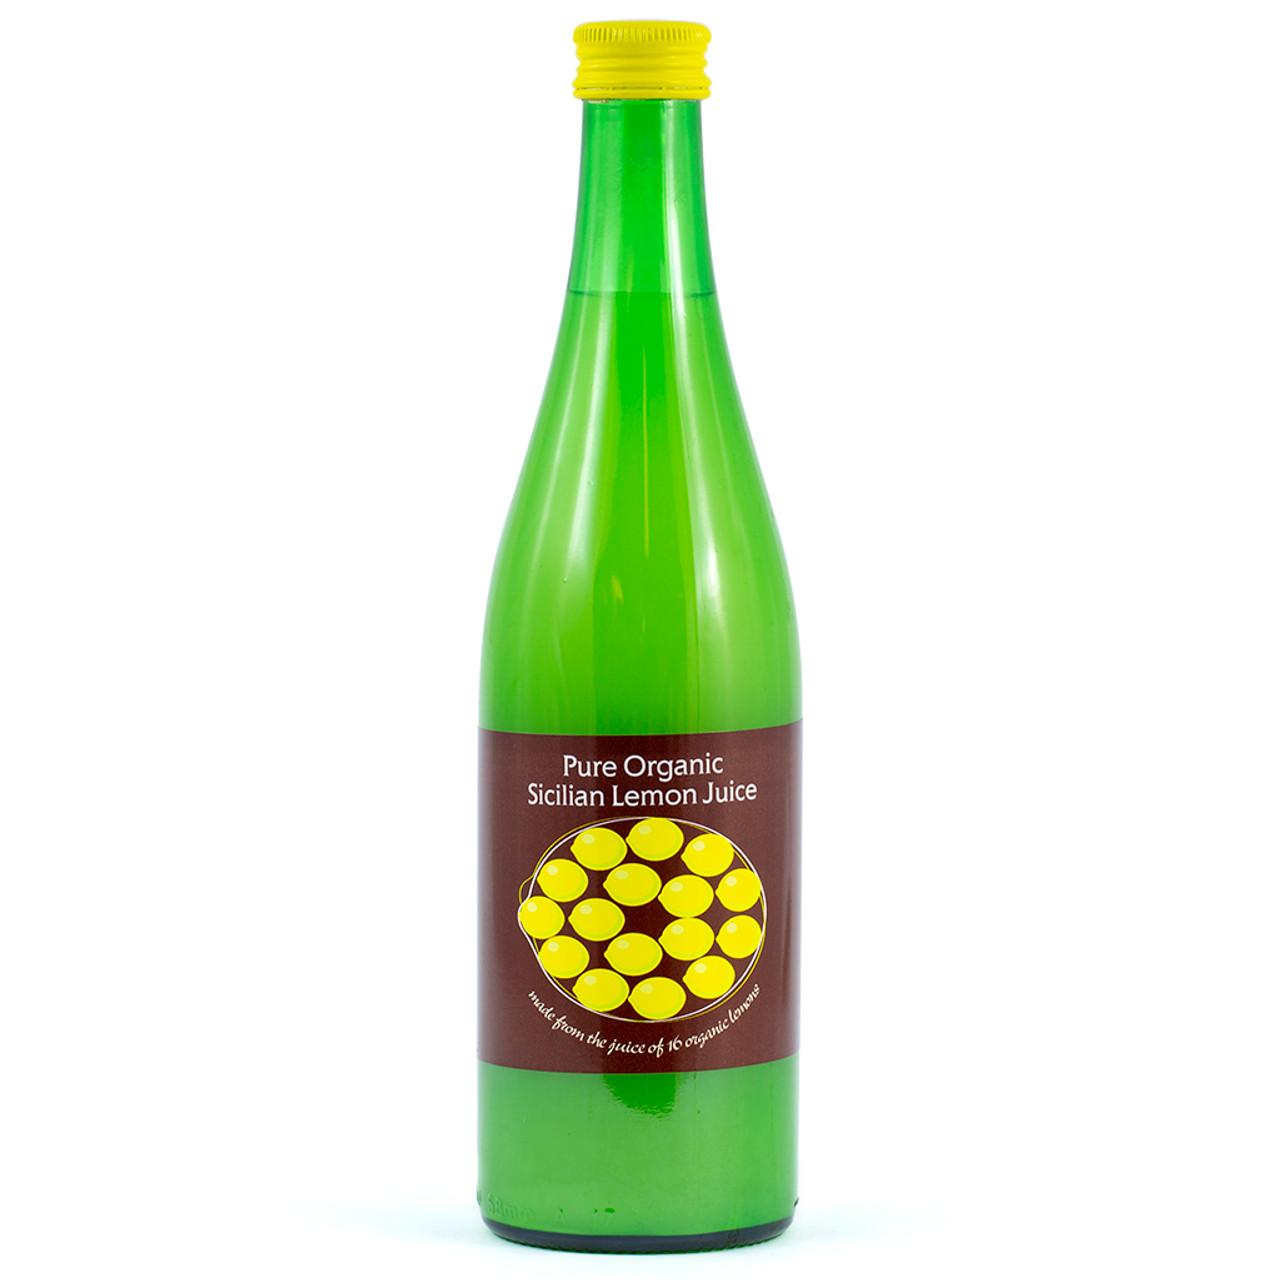 Pure Organic Sicilian Lemon Juice 500ml